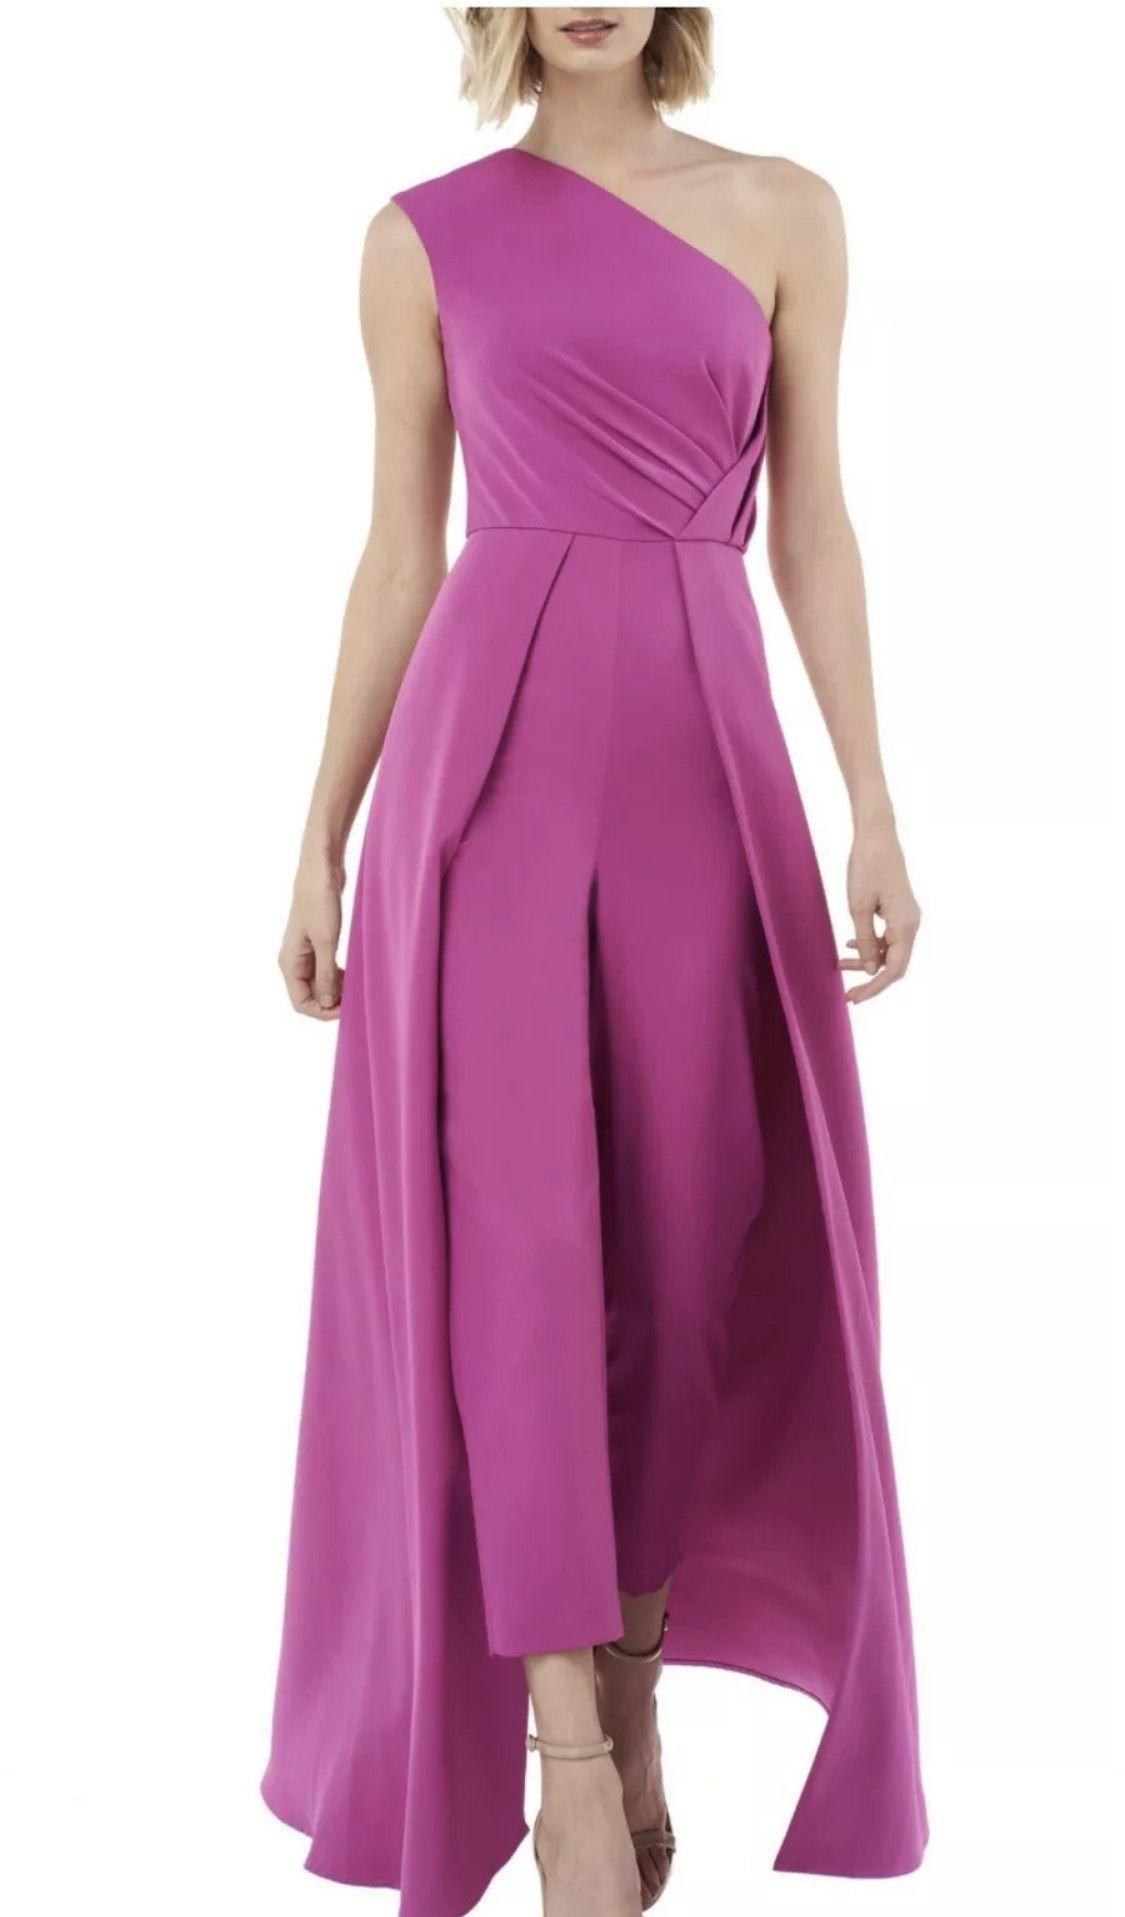 Kay Unger Pink Size 10 One Shoulder Jumpsuit Dress on Queenly